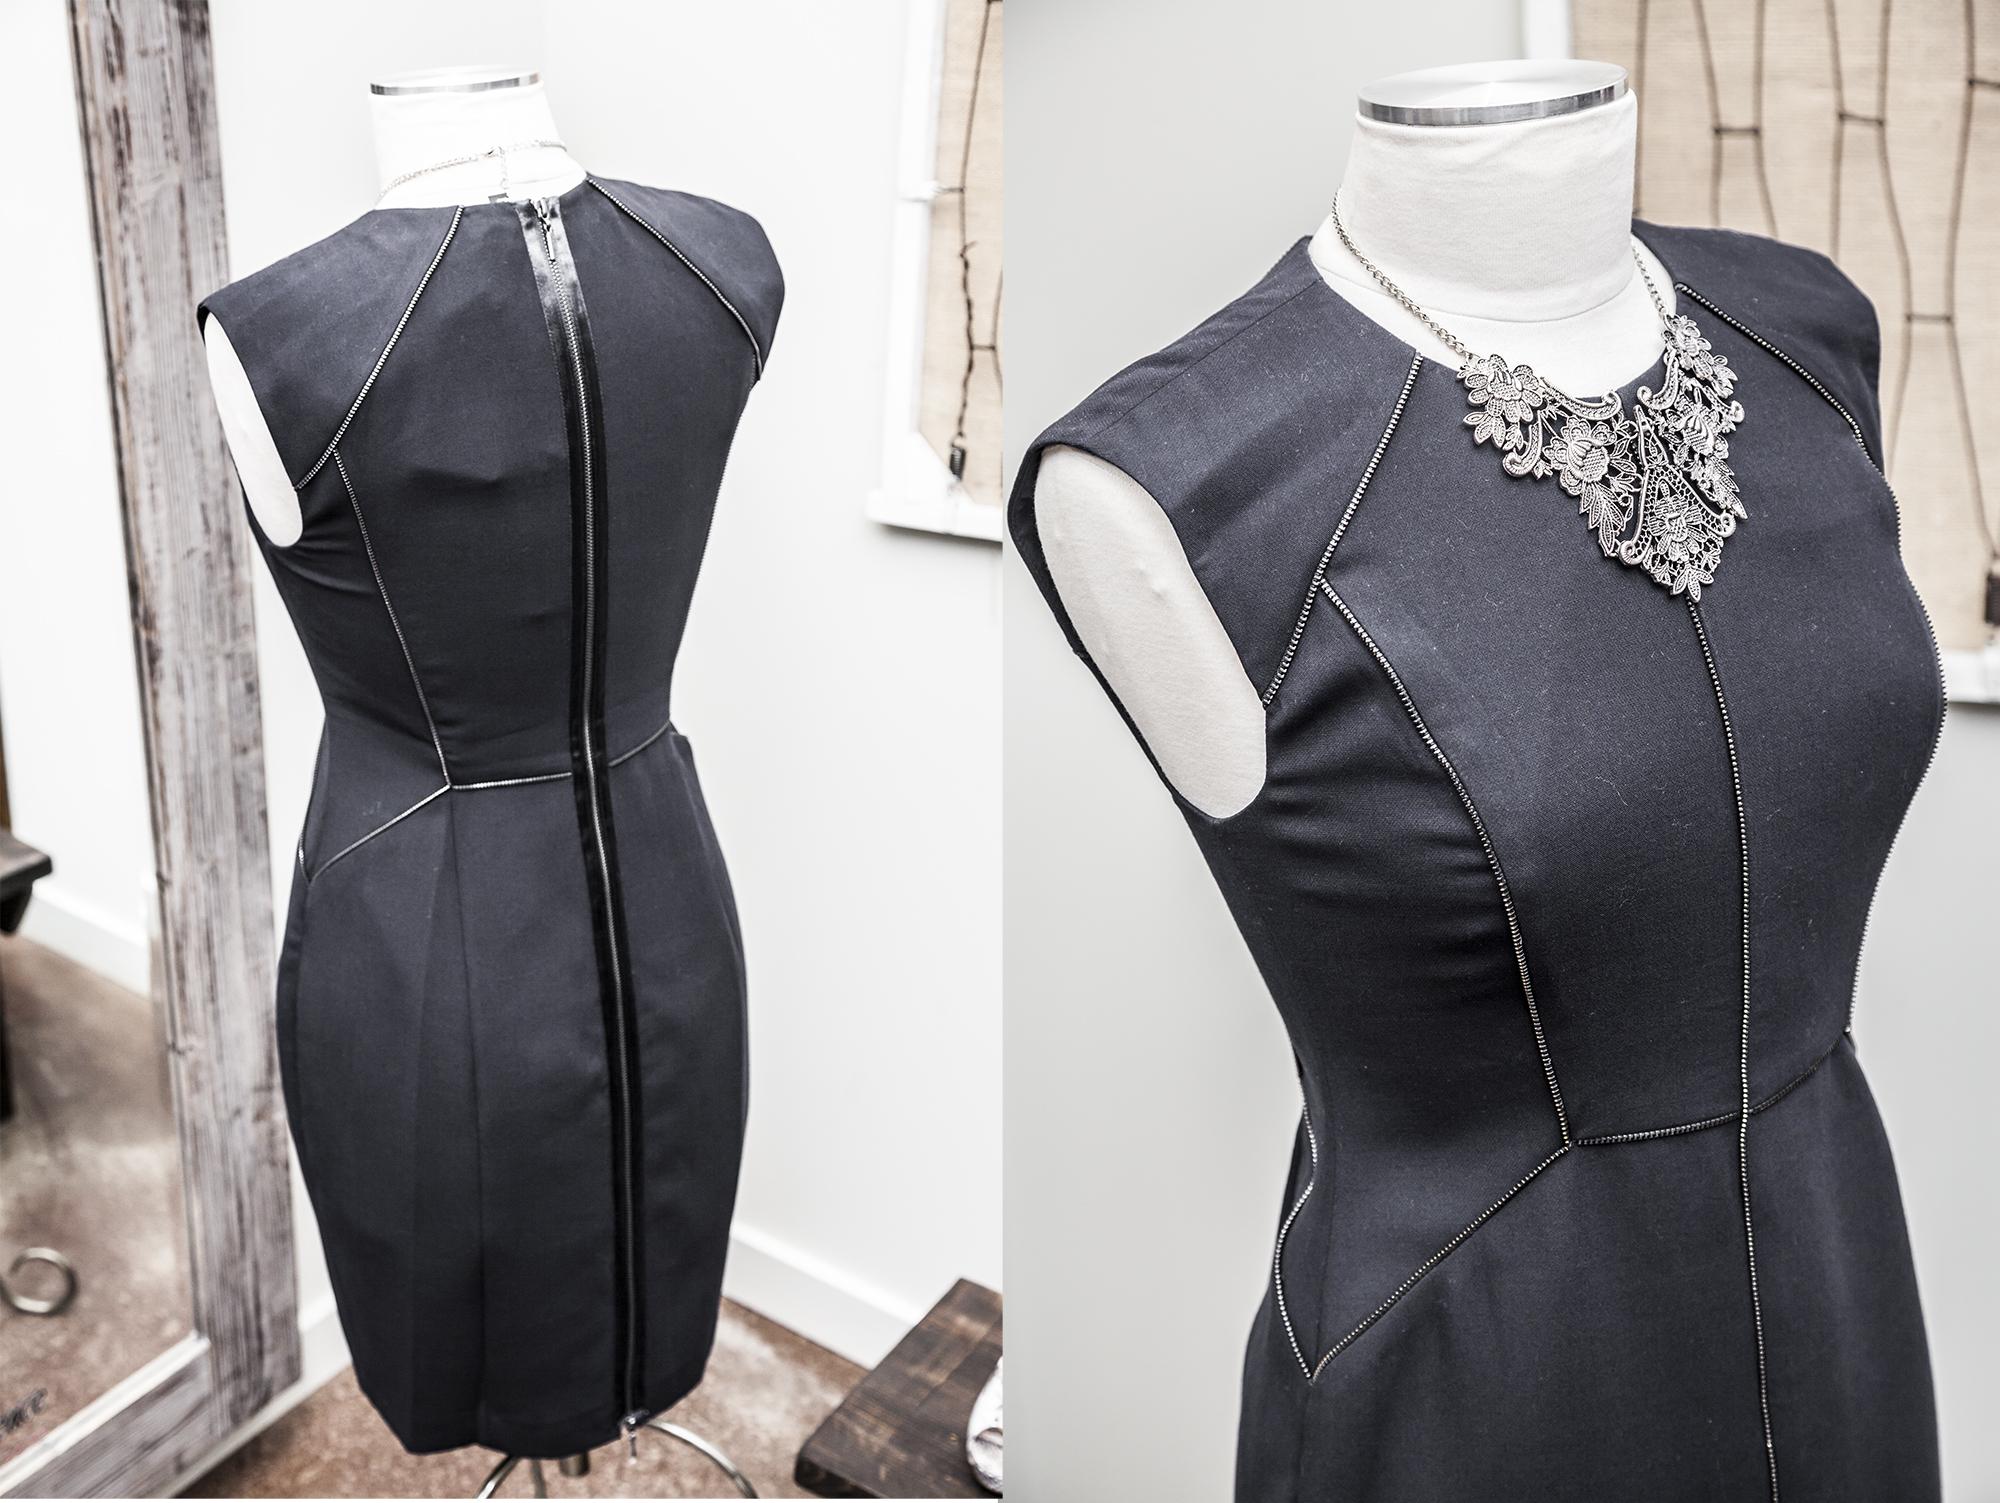 elegant-dresses-and-workwear-at-bella-maas-boutique-edmonton